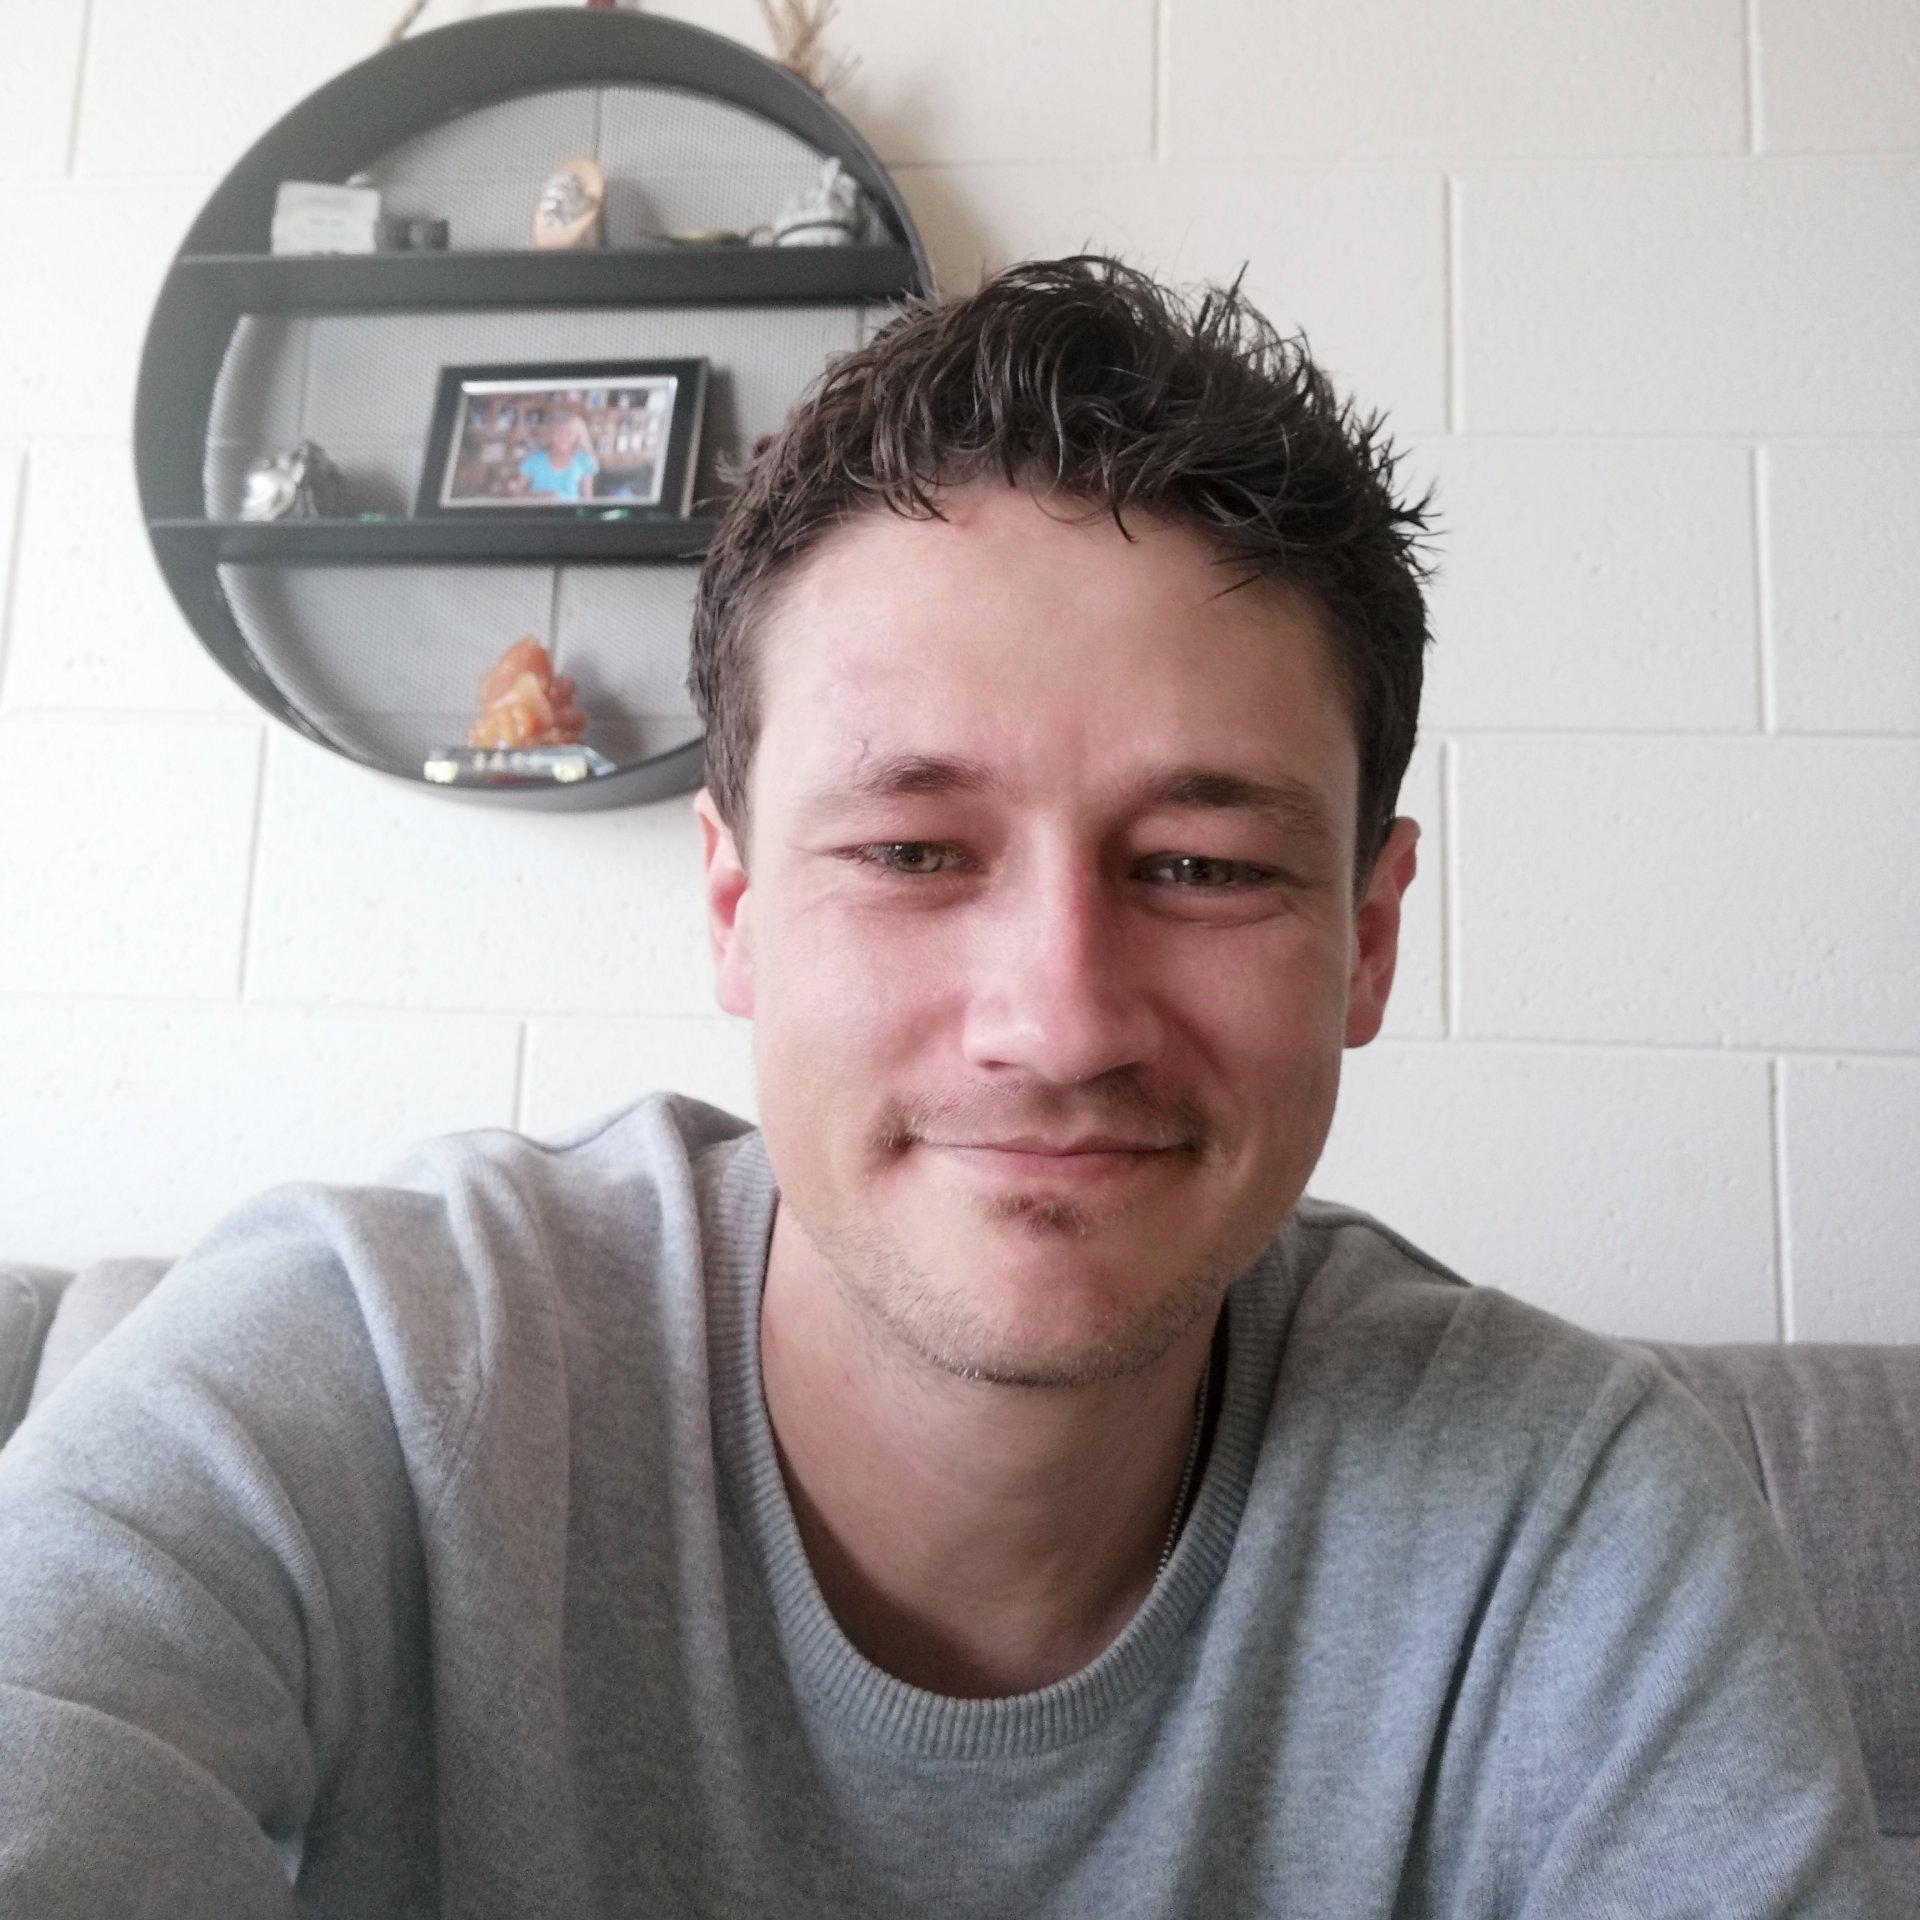 Niceguywithdirtymind from South Australia,Australia